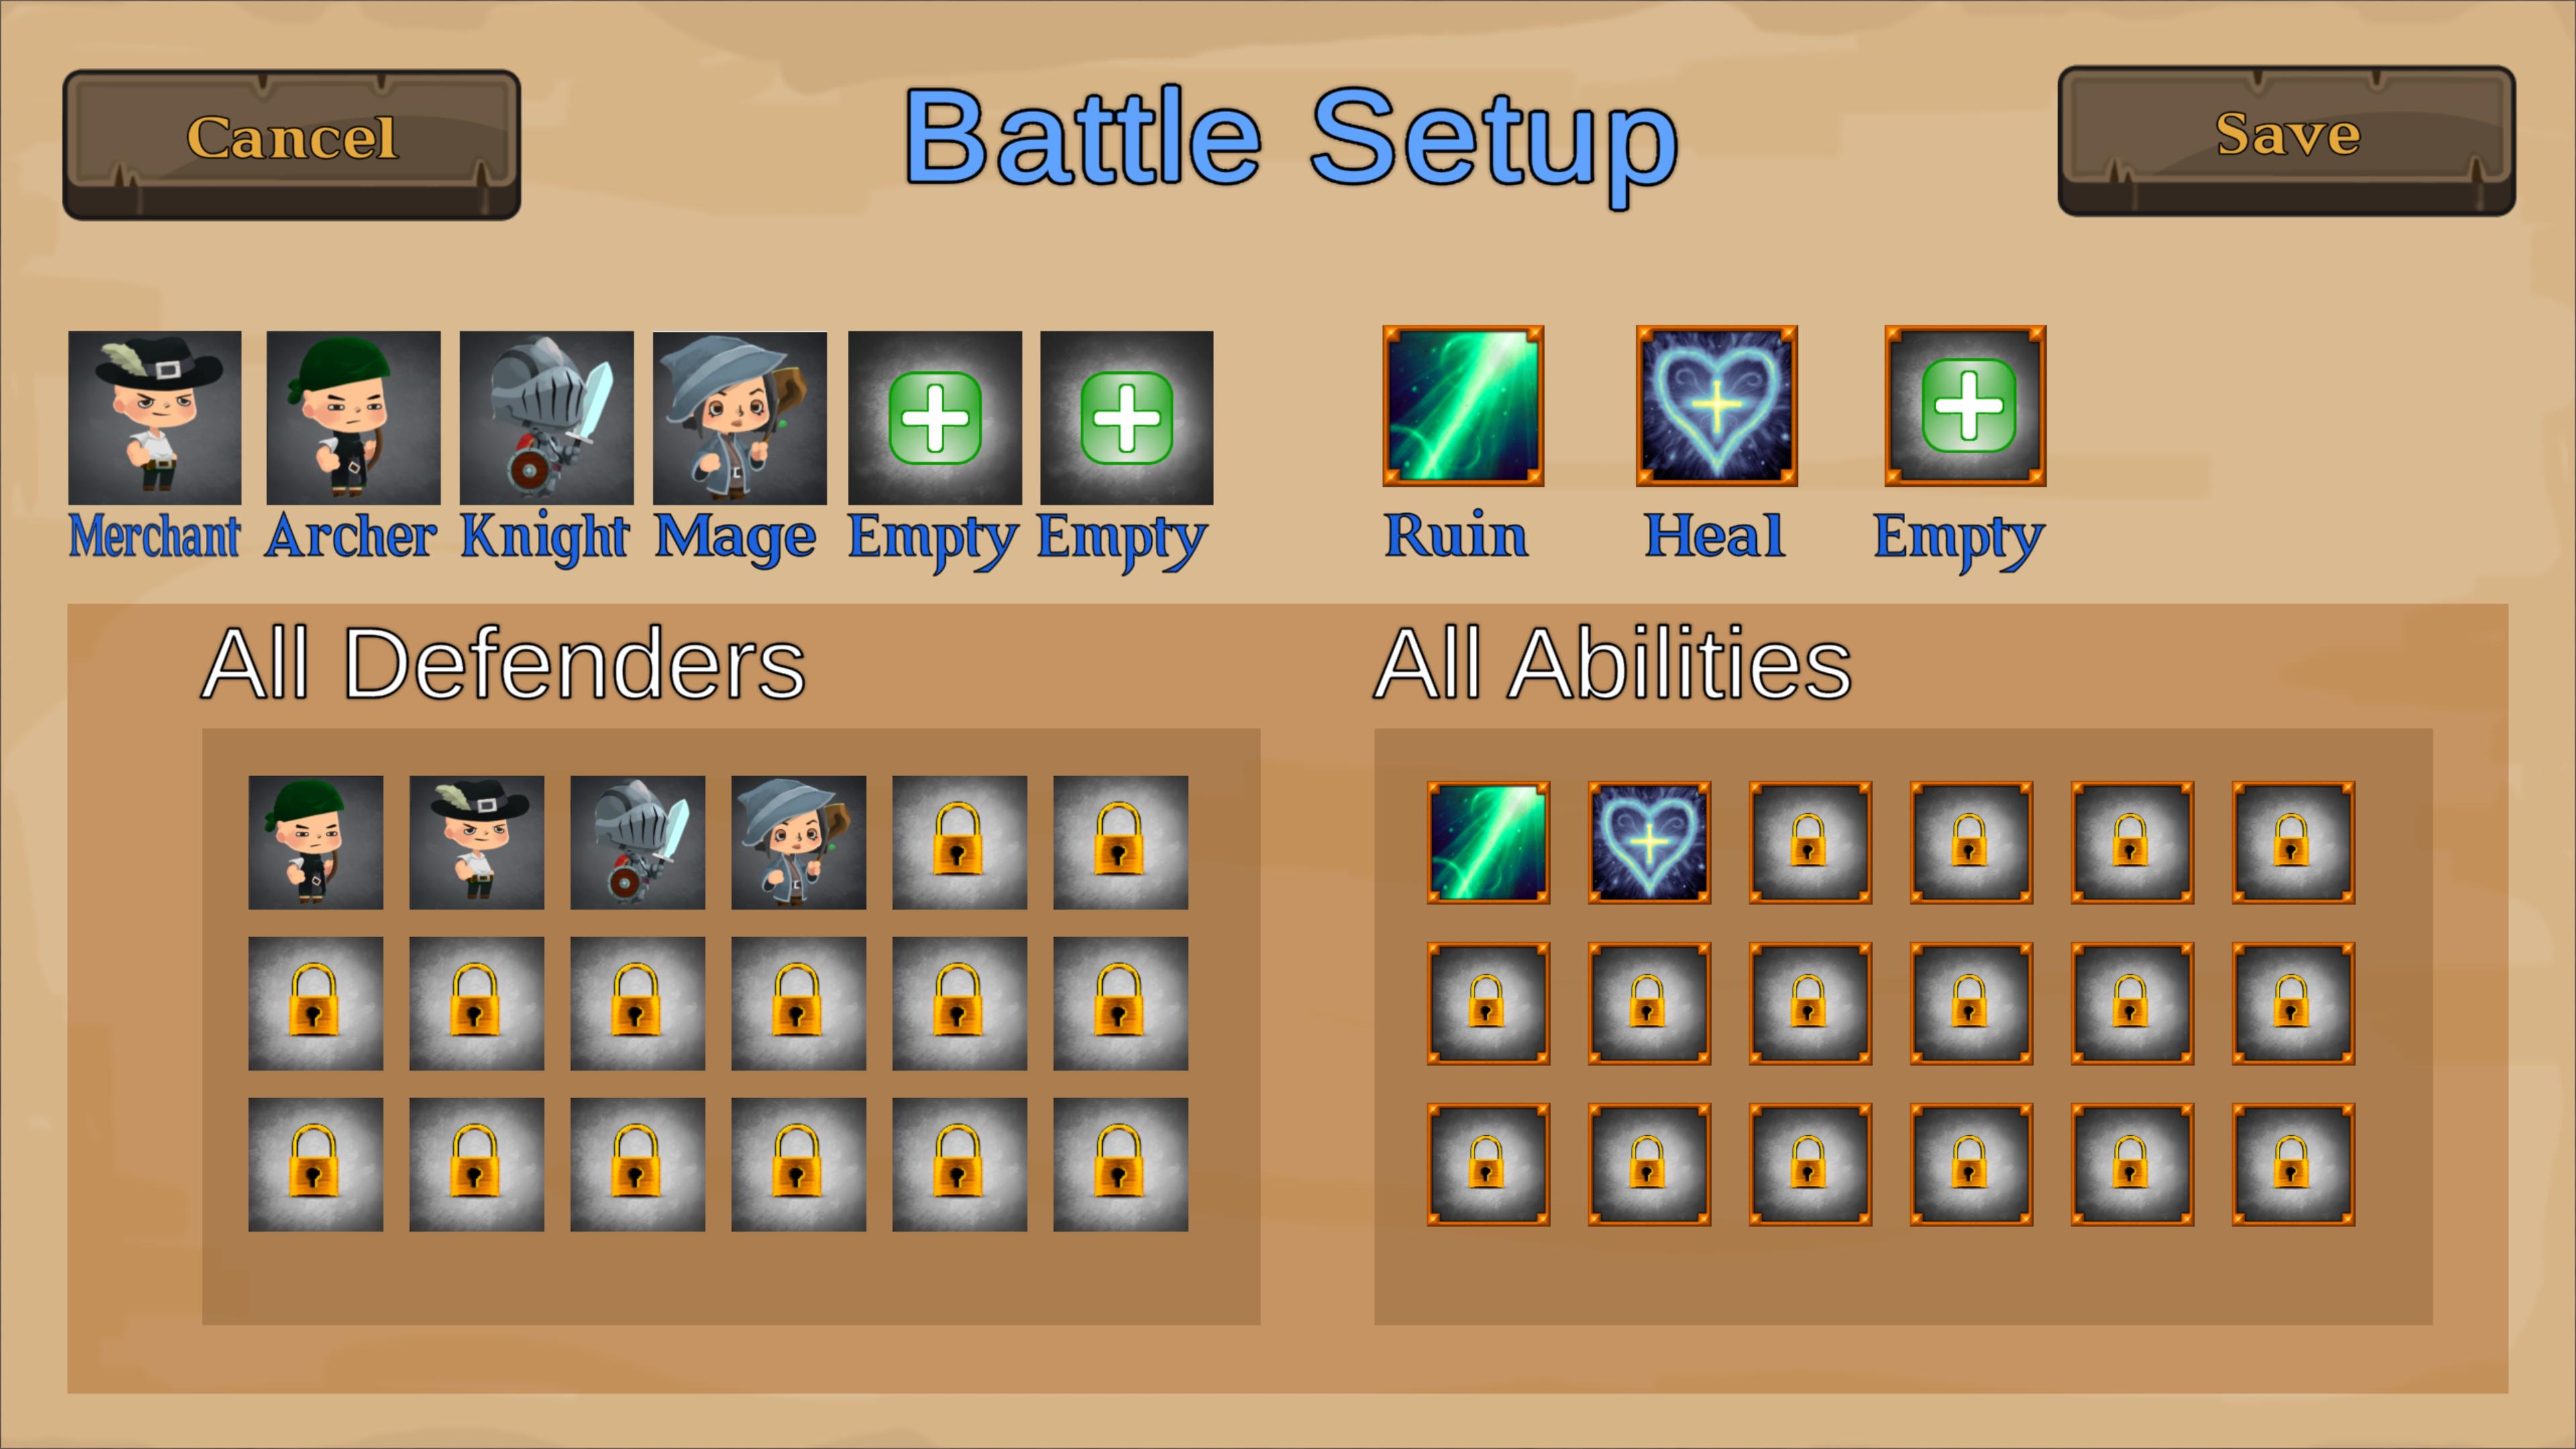 battleSetup